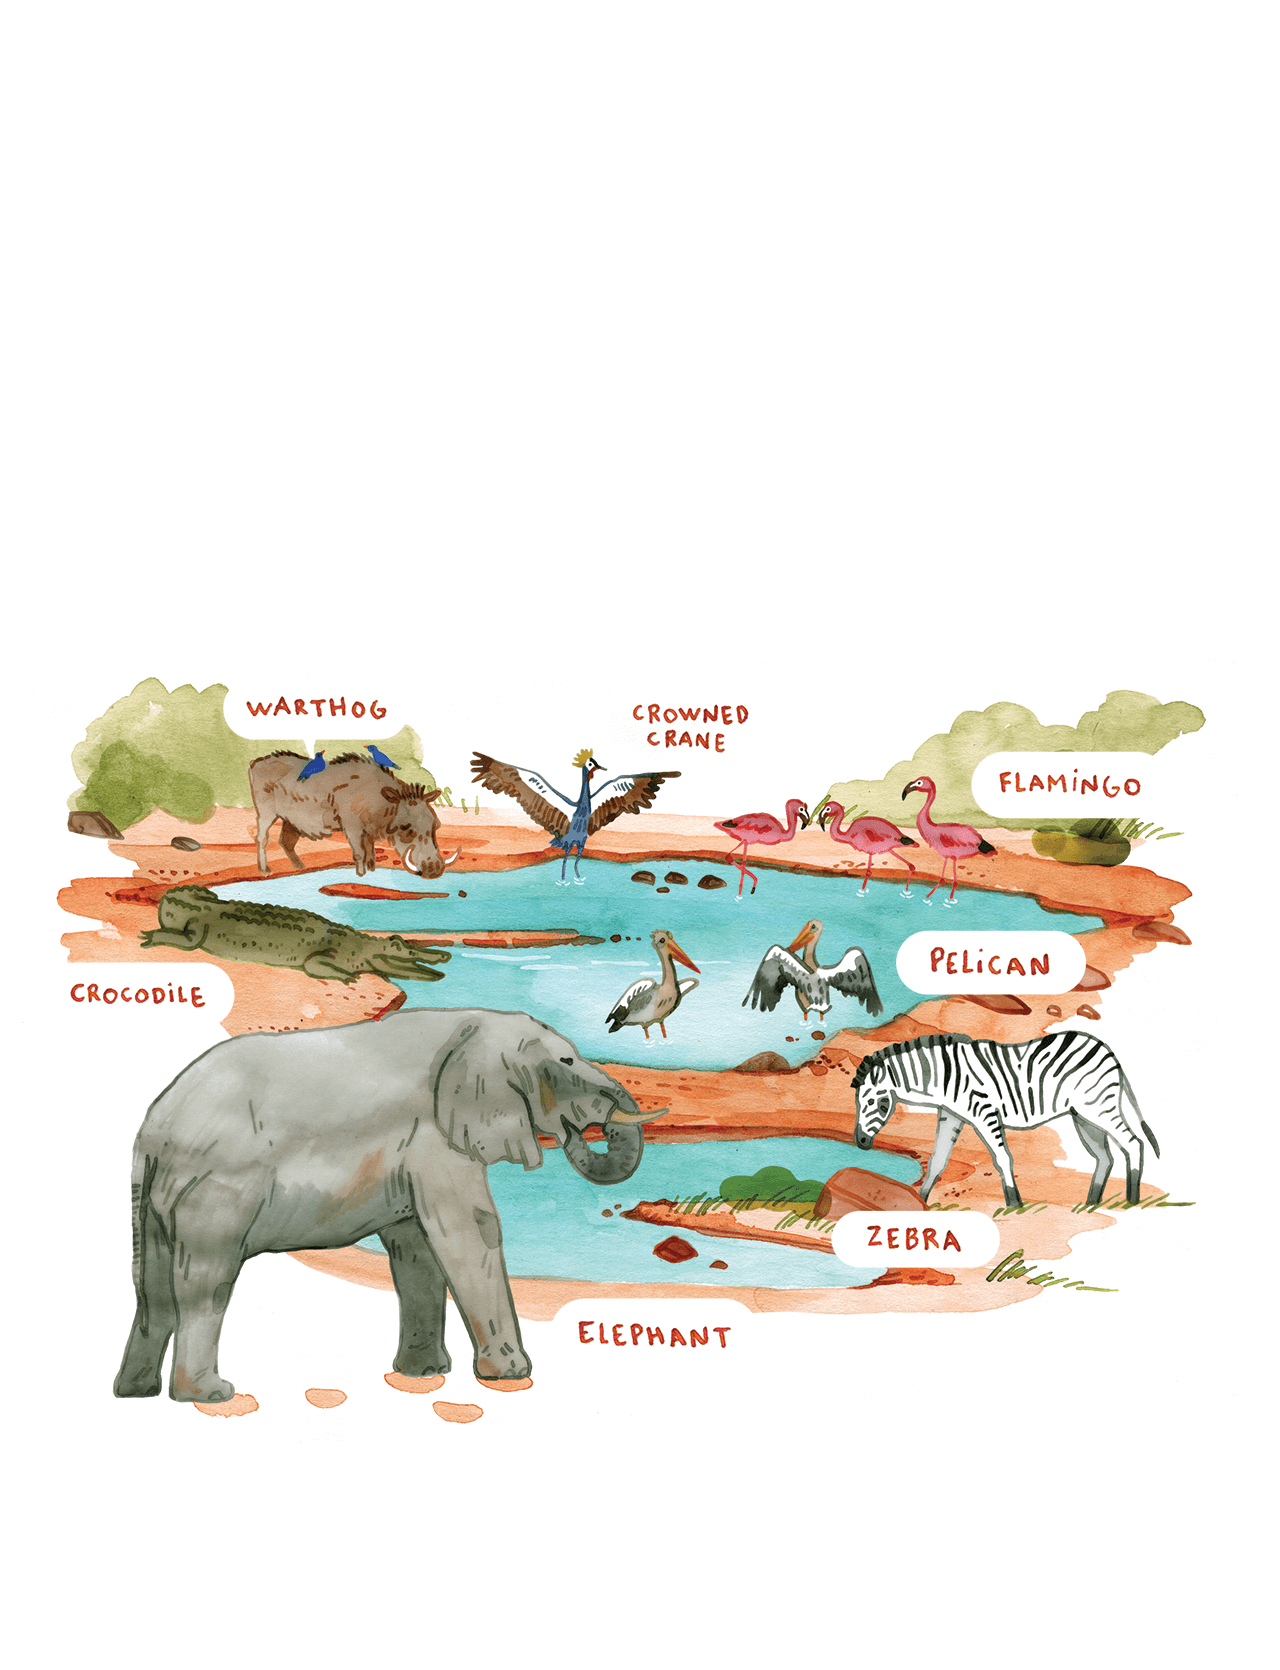 Editorial illustration of a waterhole in Senegal